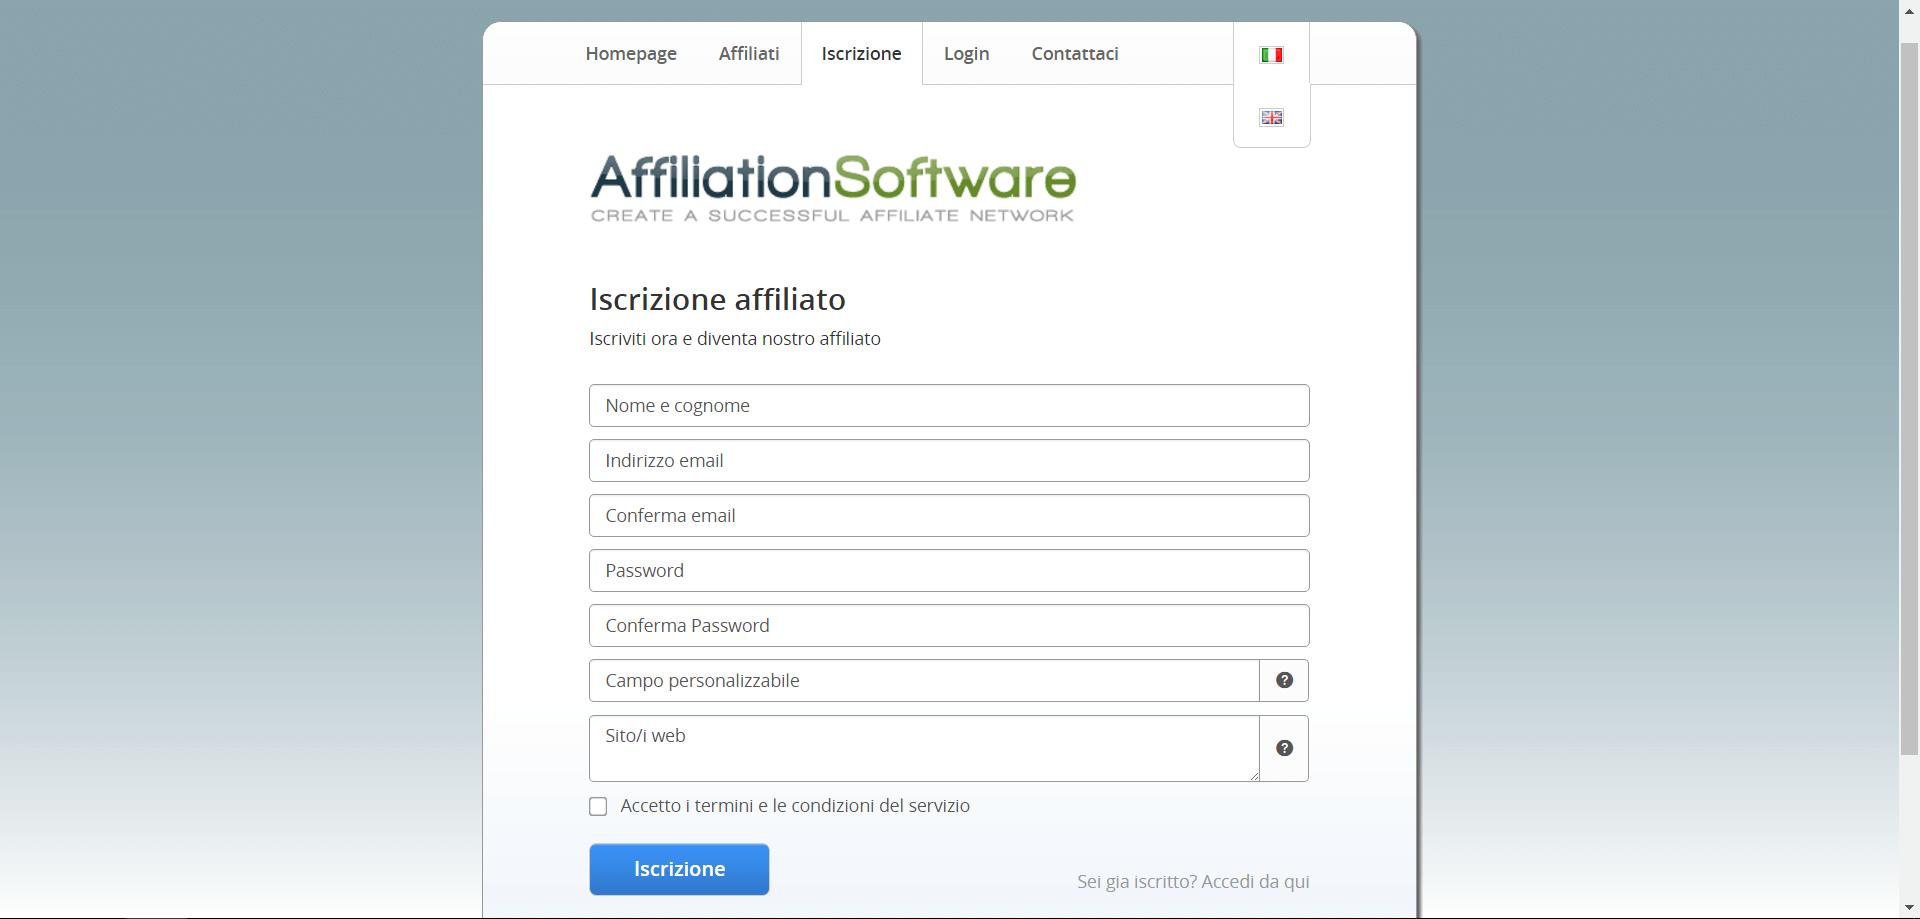 Pagina di iscrizione di AffiliationSoftware